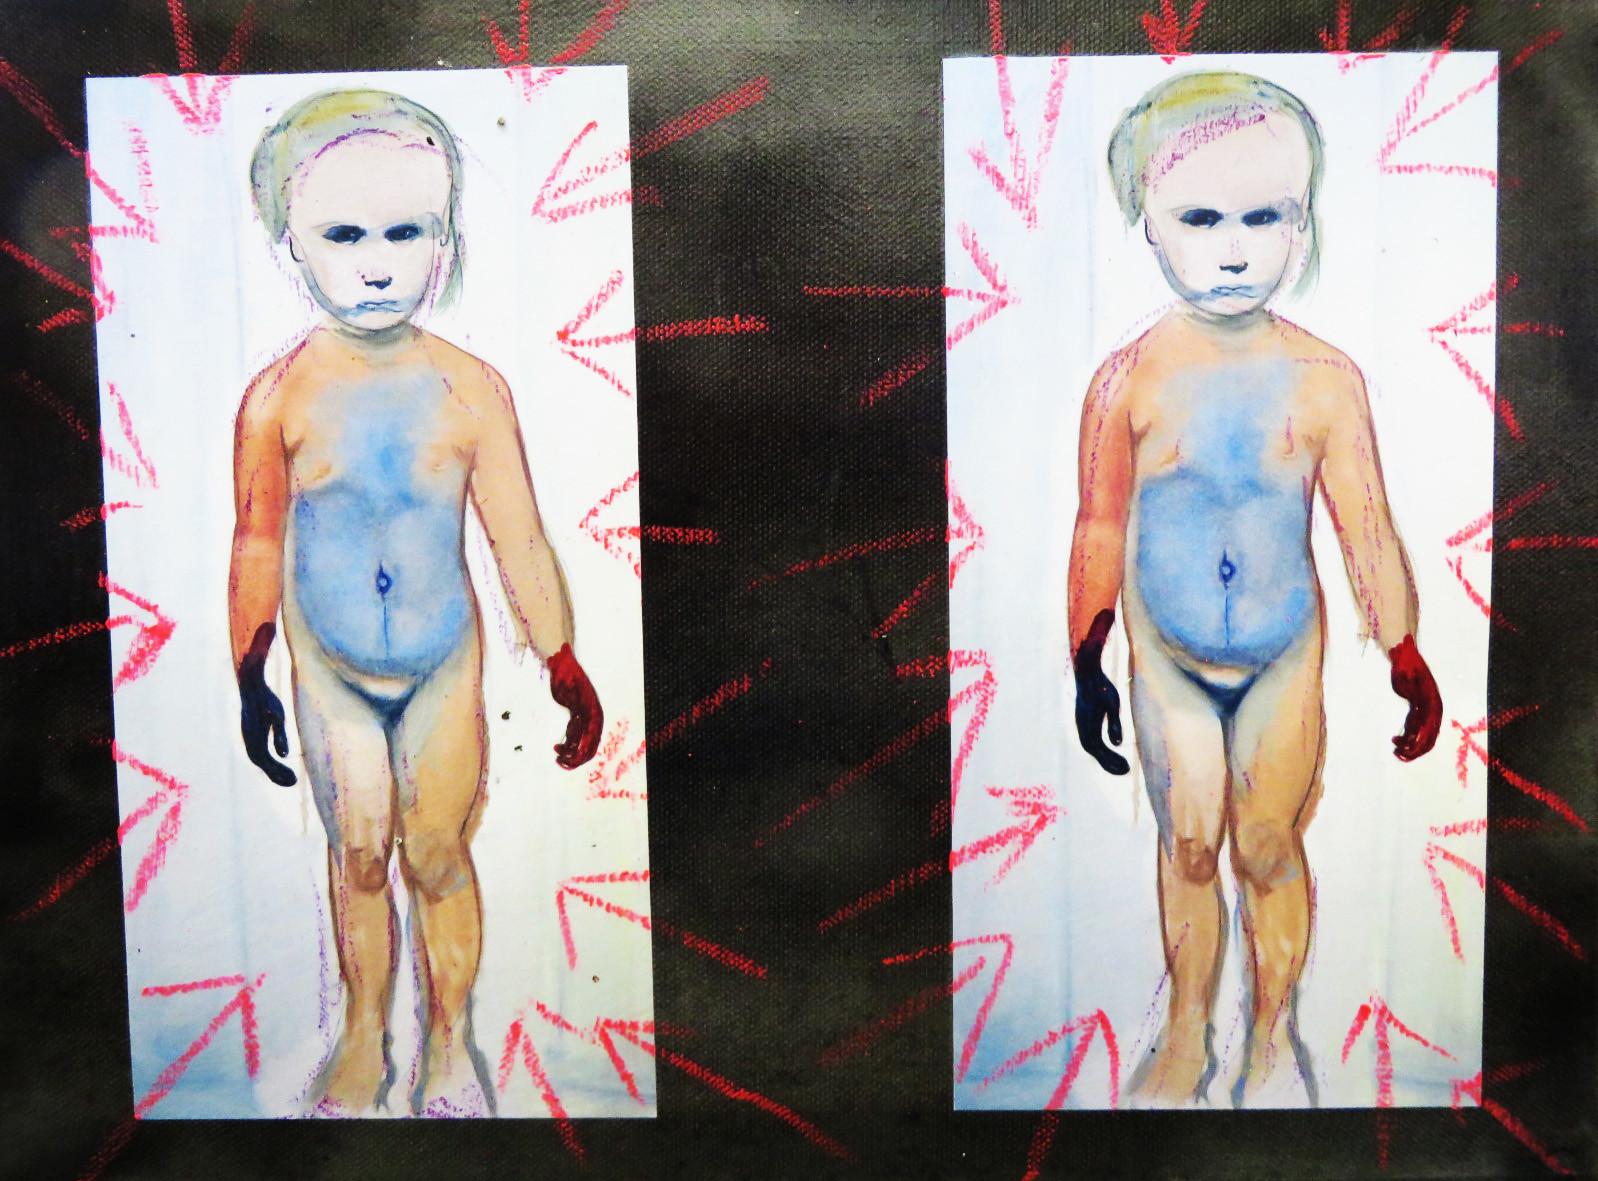 Pedro Meier – Einladungskarte Fondation Beyeler übermalt – Basel Ölstift 2016 – Foto © Pedro Meier / ProLitteris Multimedia Artist – Atelier: Gerhard Meier Weg Niederbipp – Olten – Bangkok